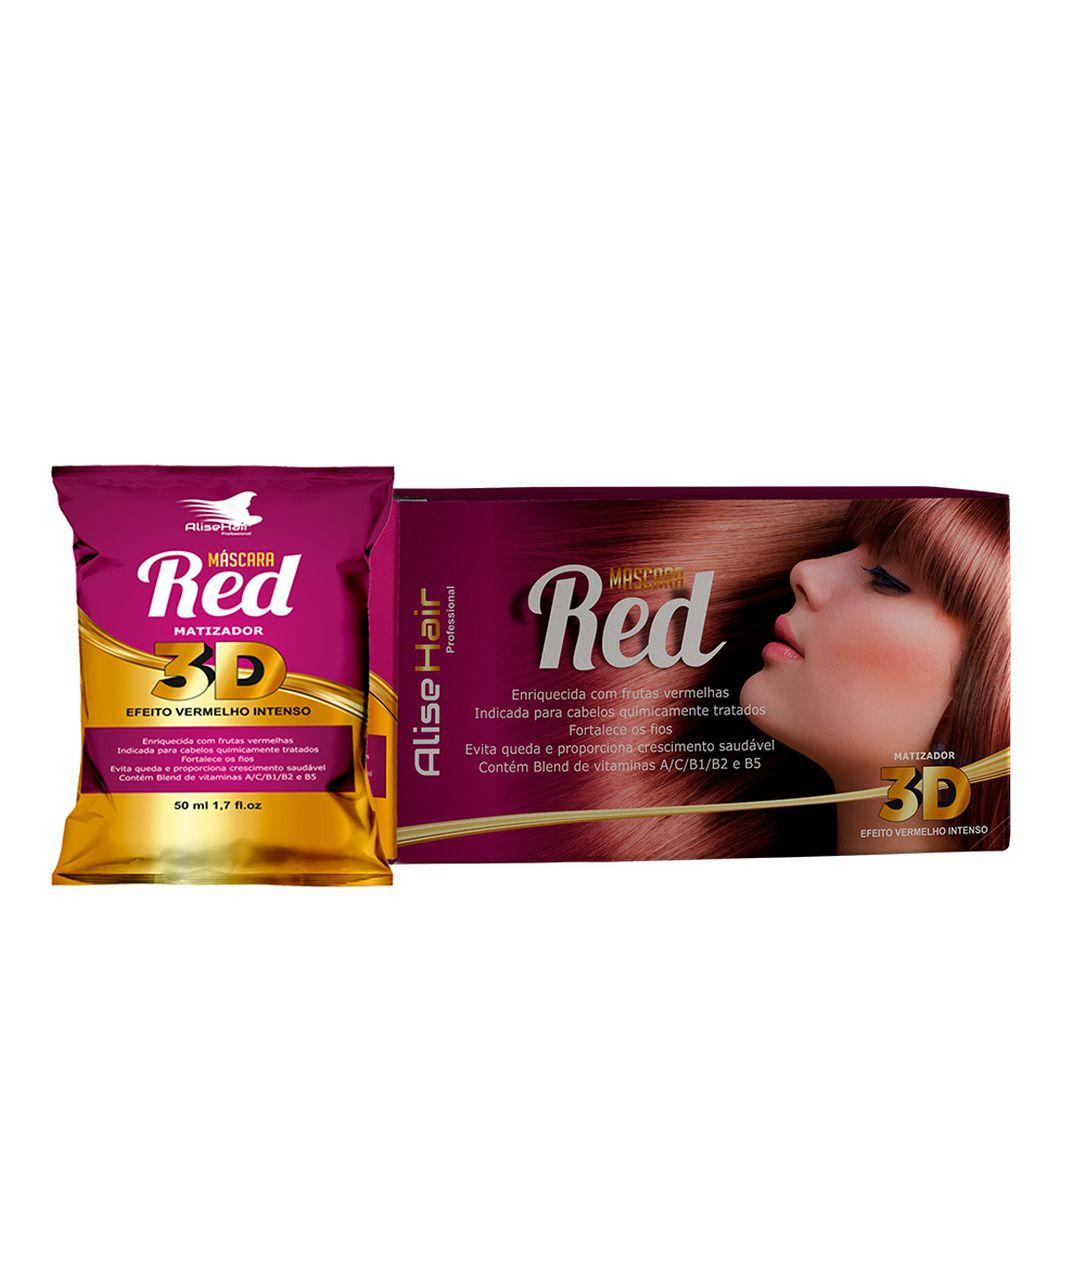 MATIZADOR RED 3D 50ML - KIT C/ 24 UNIDADES